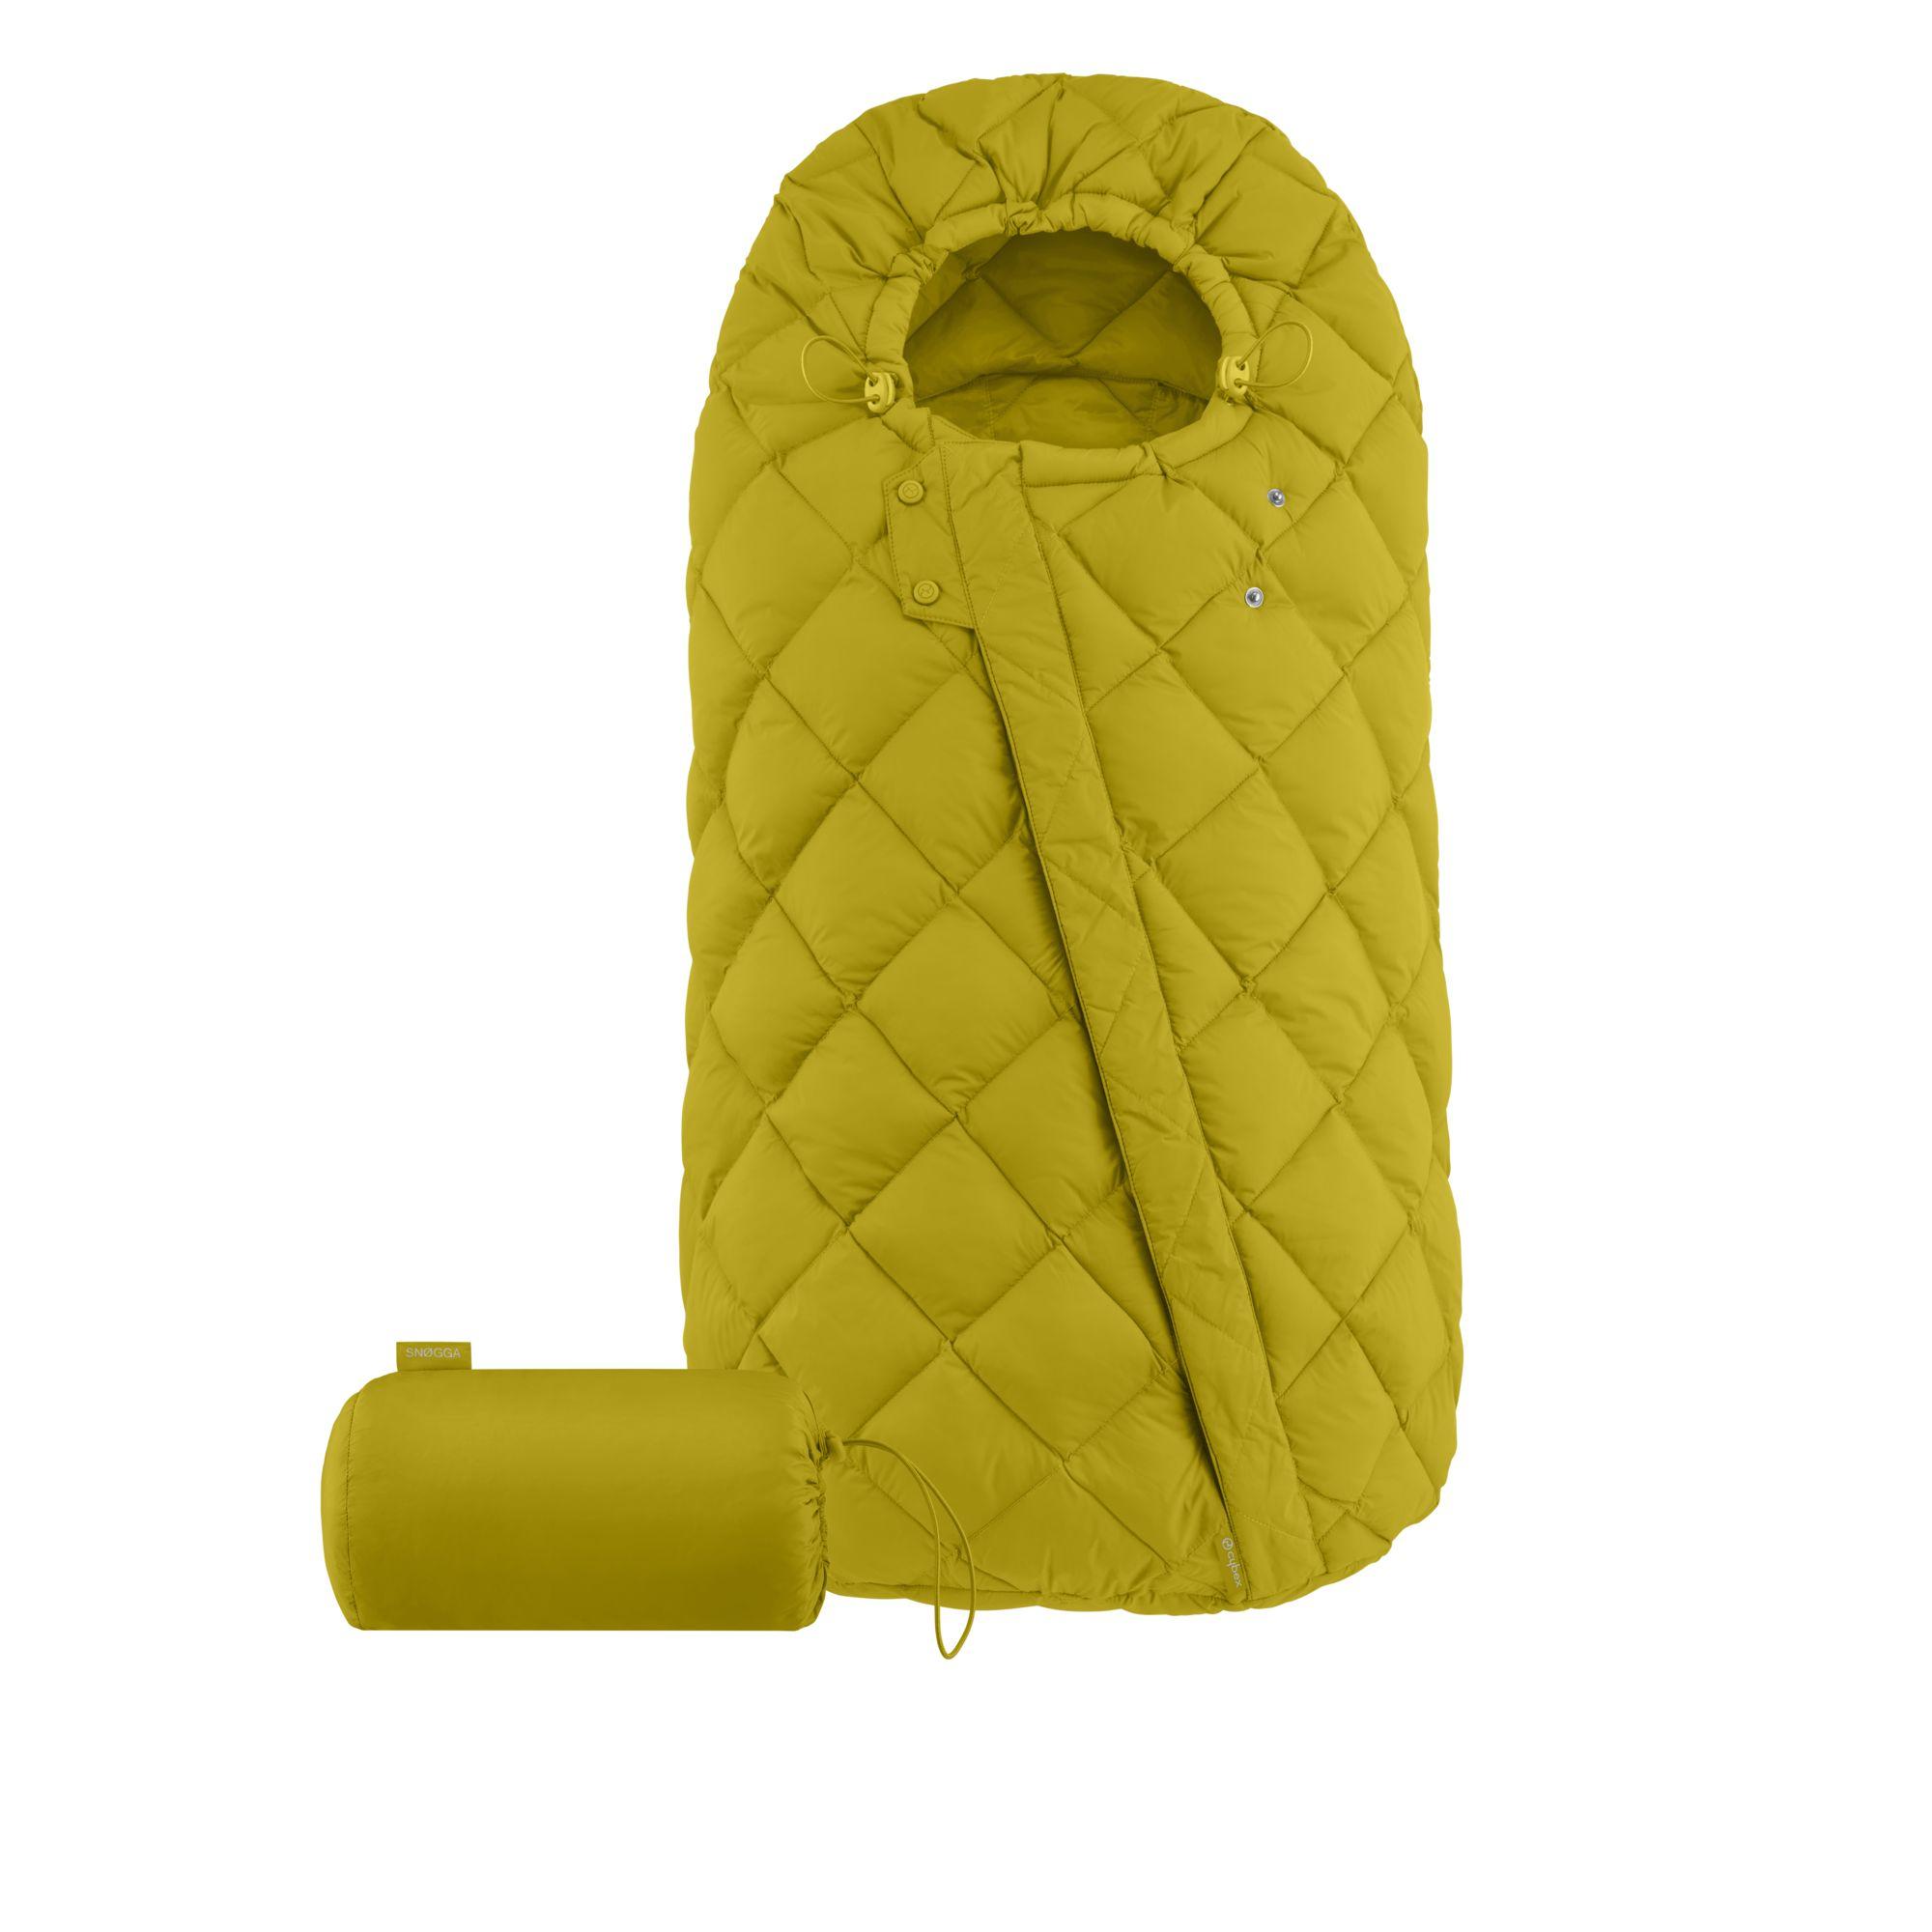 CYBEX Fusak snogga mustard yellow